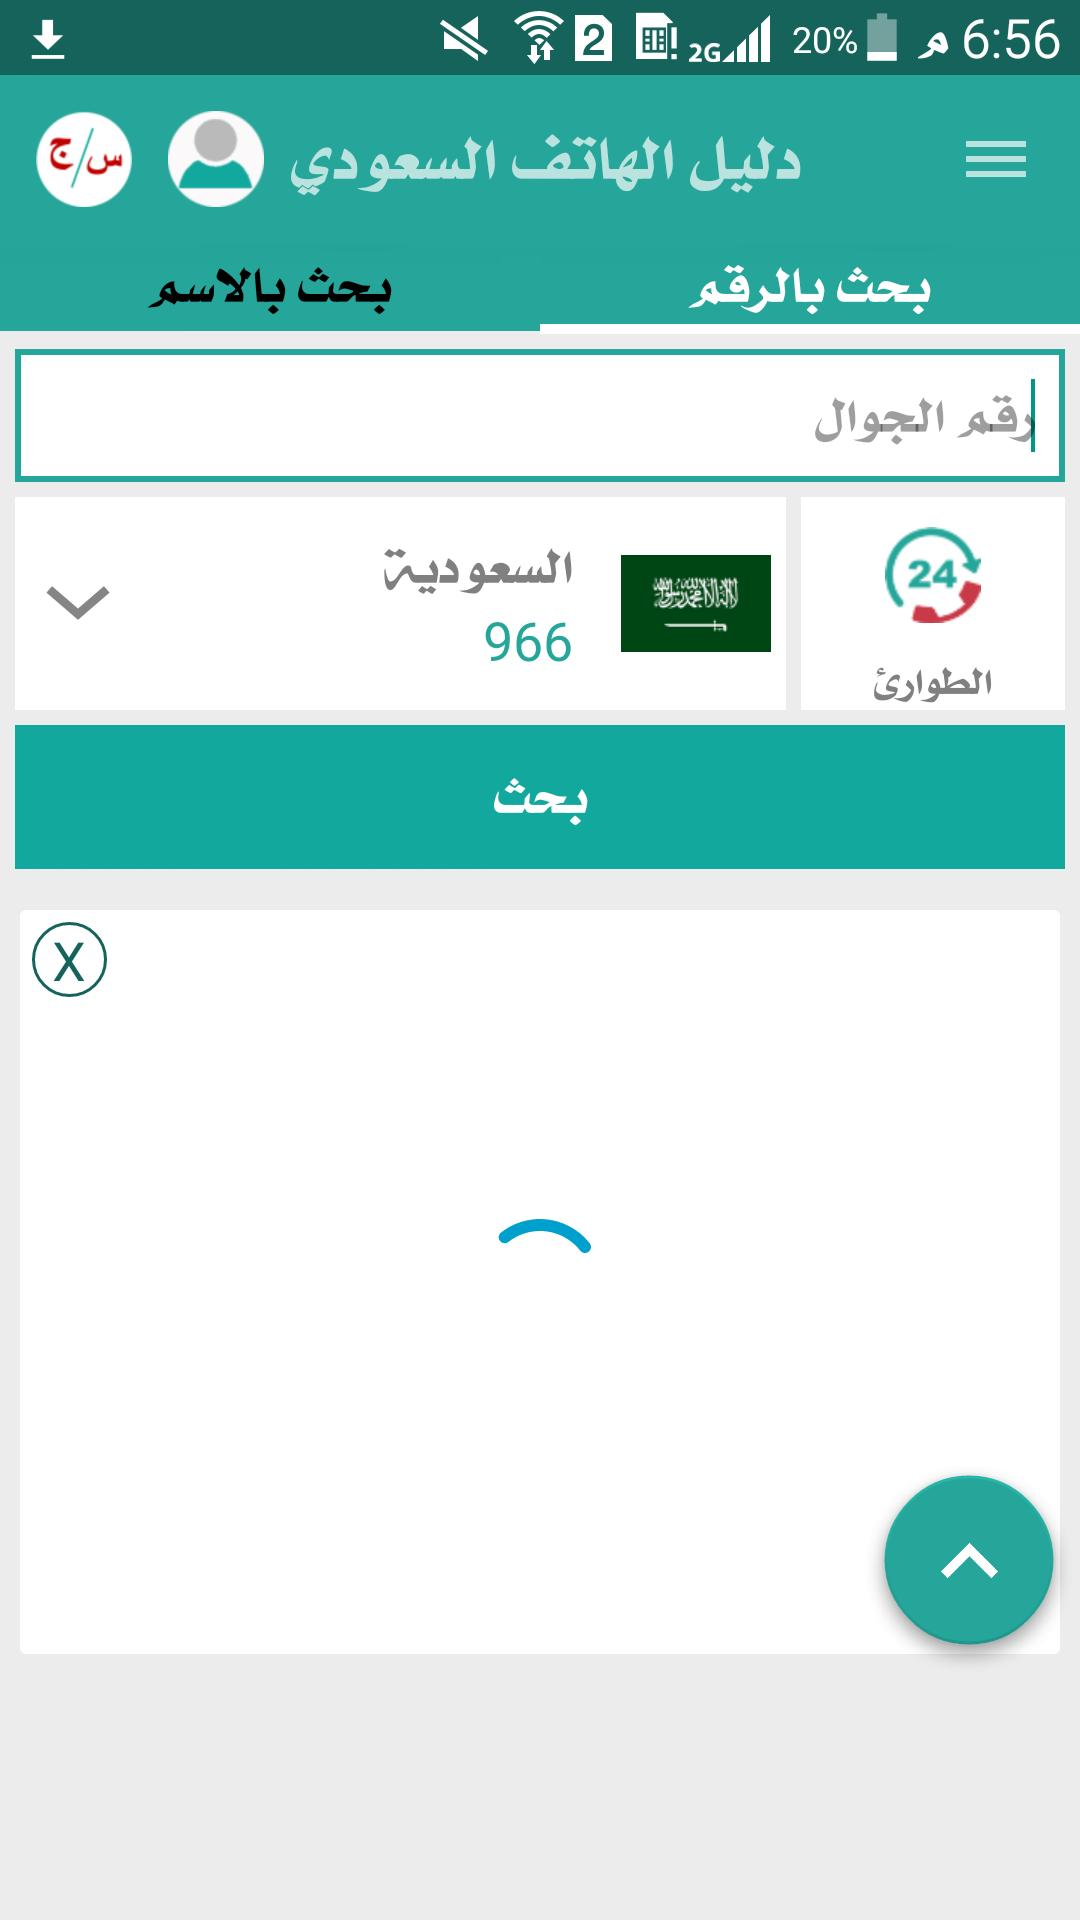 دليل الهاتف السعودي بحث بالاسم For Android Apk Download